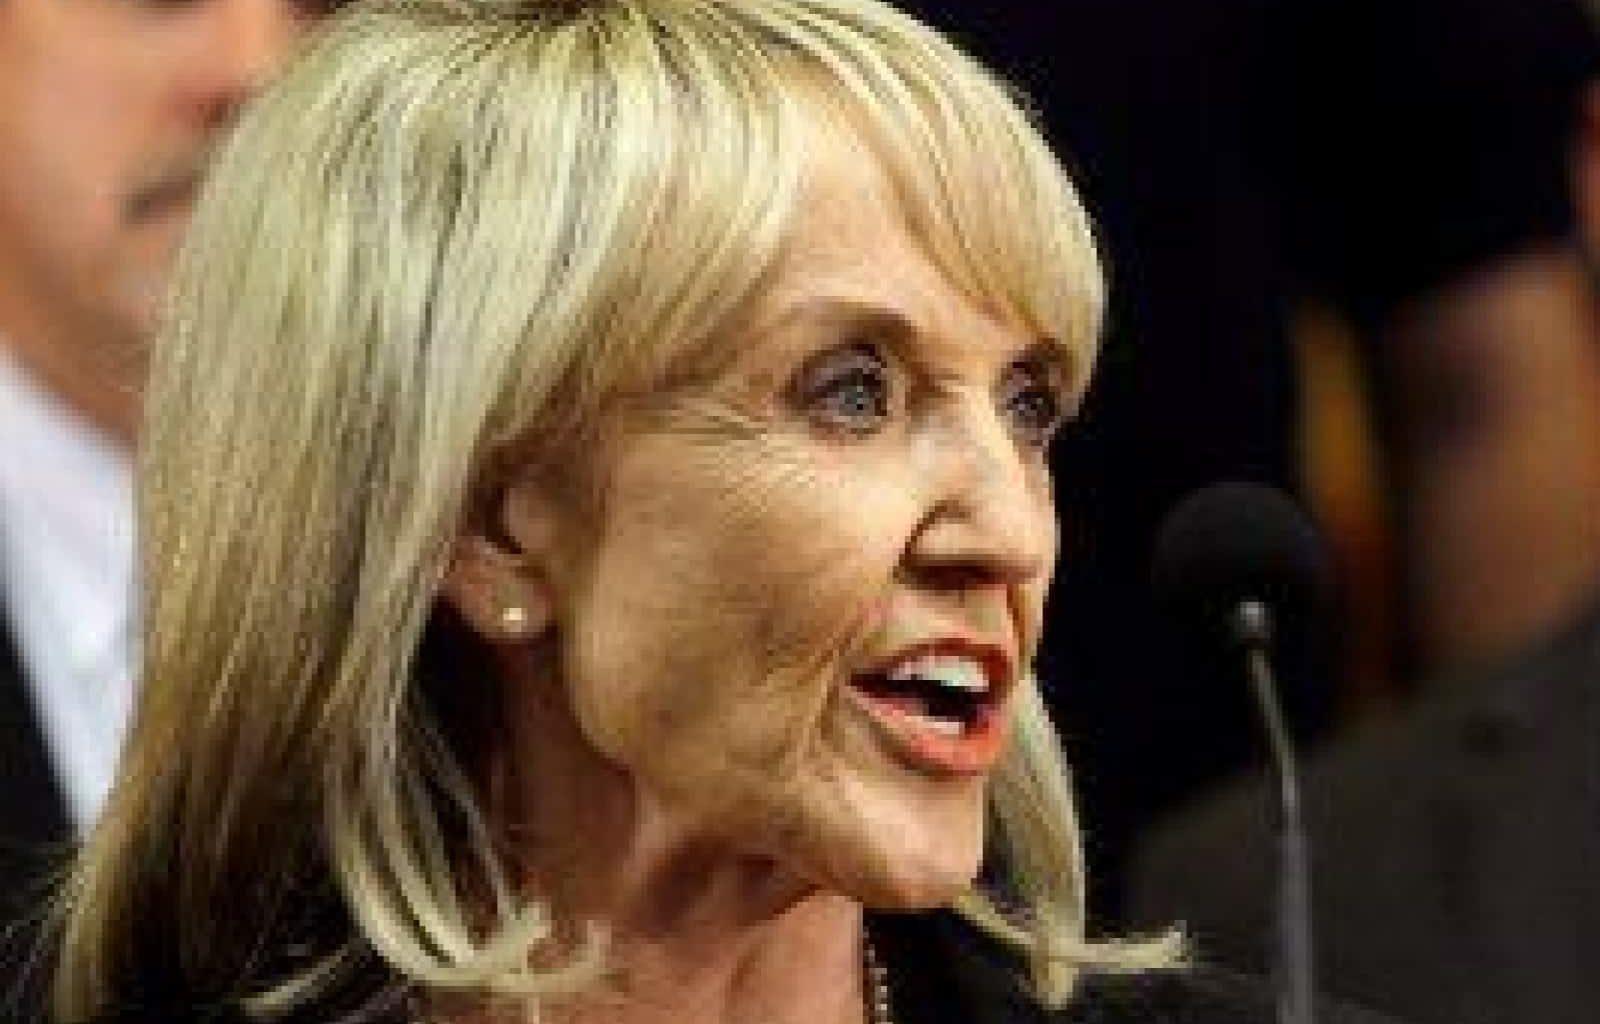 Gov. Jan Brewer Leaves Arizona Broke – Still Gives Big Bonuses To Staff